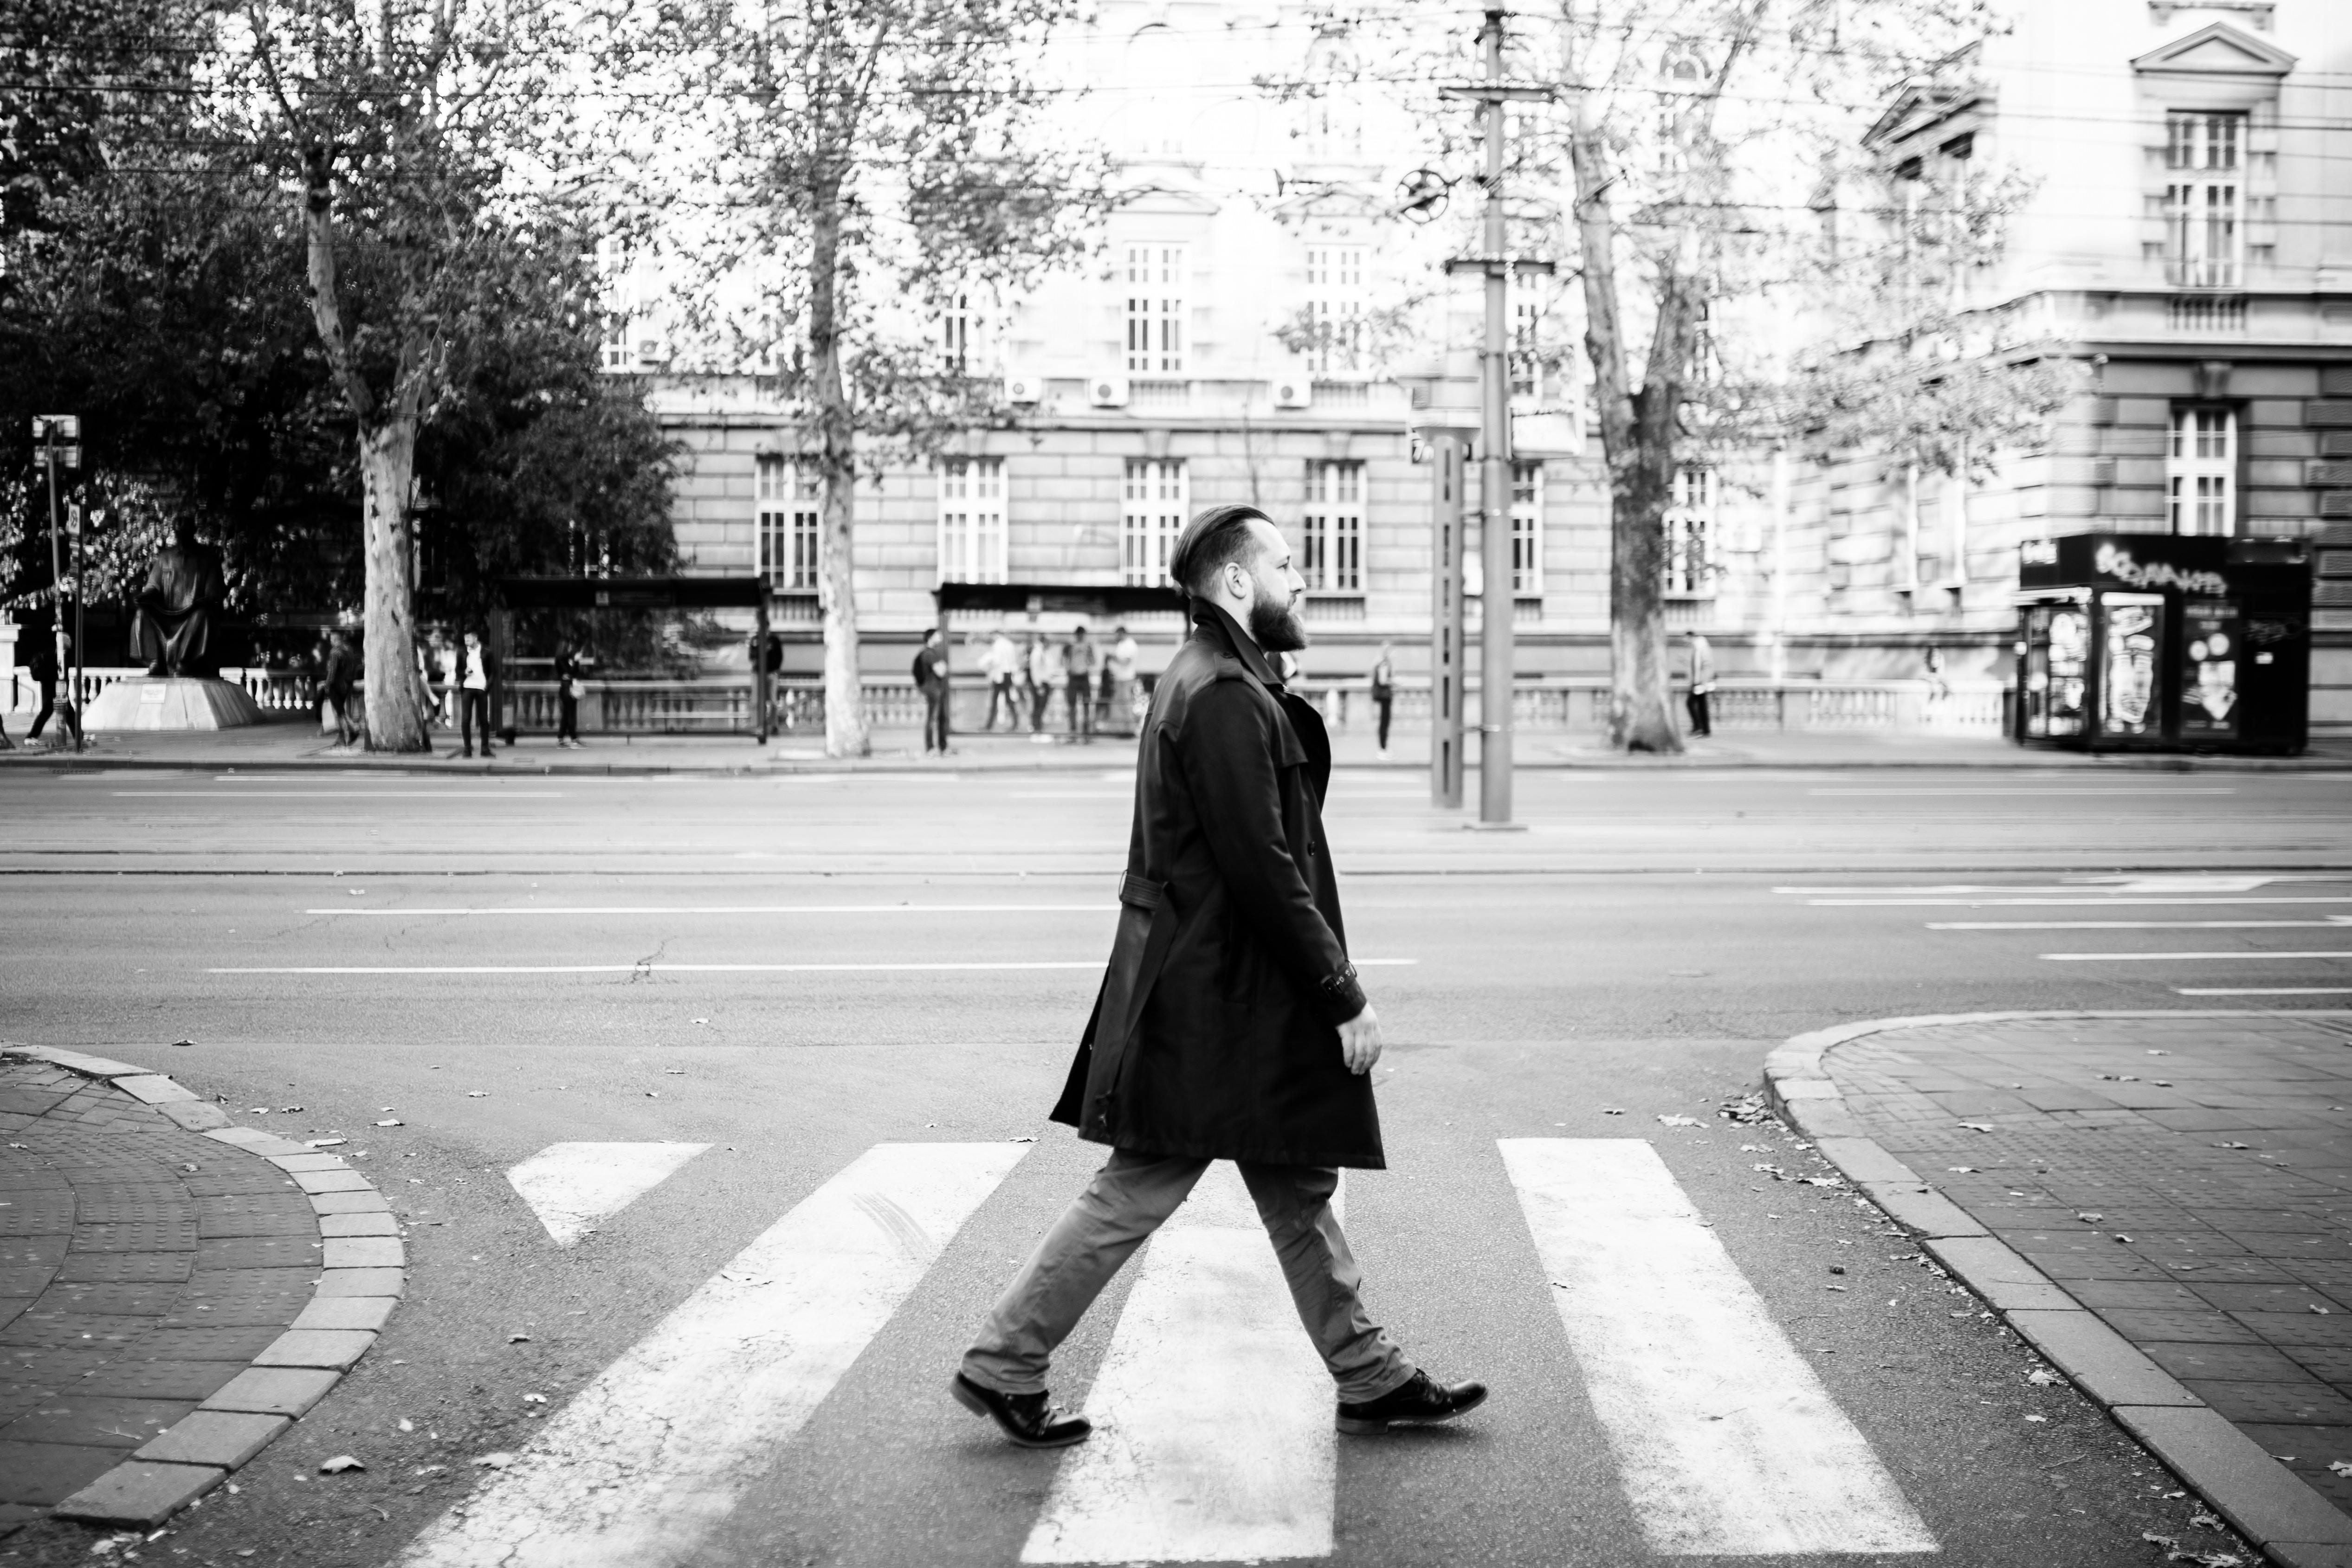 greyscale photo of man walking in pedestrian